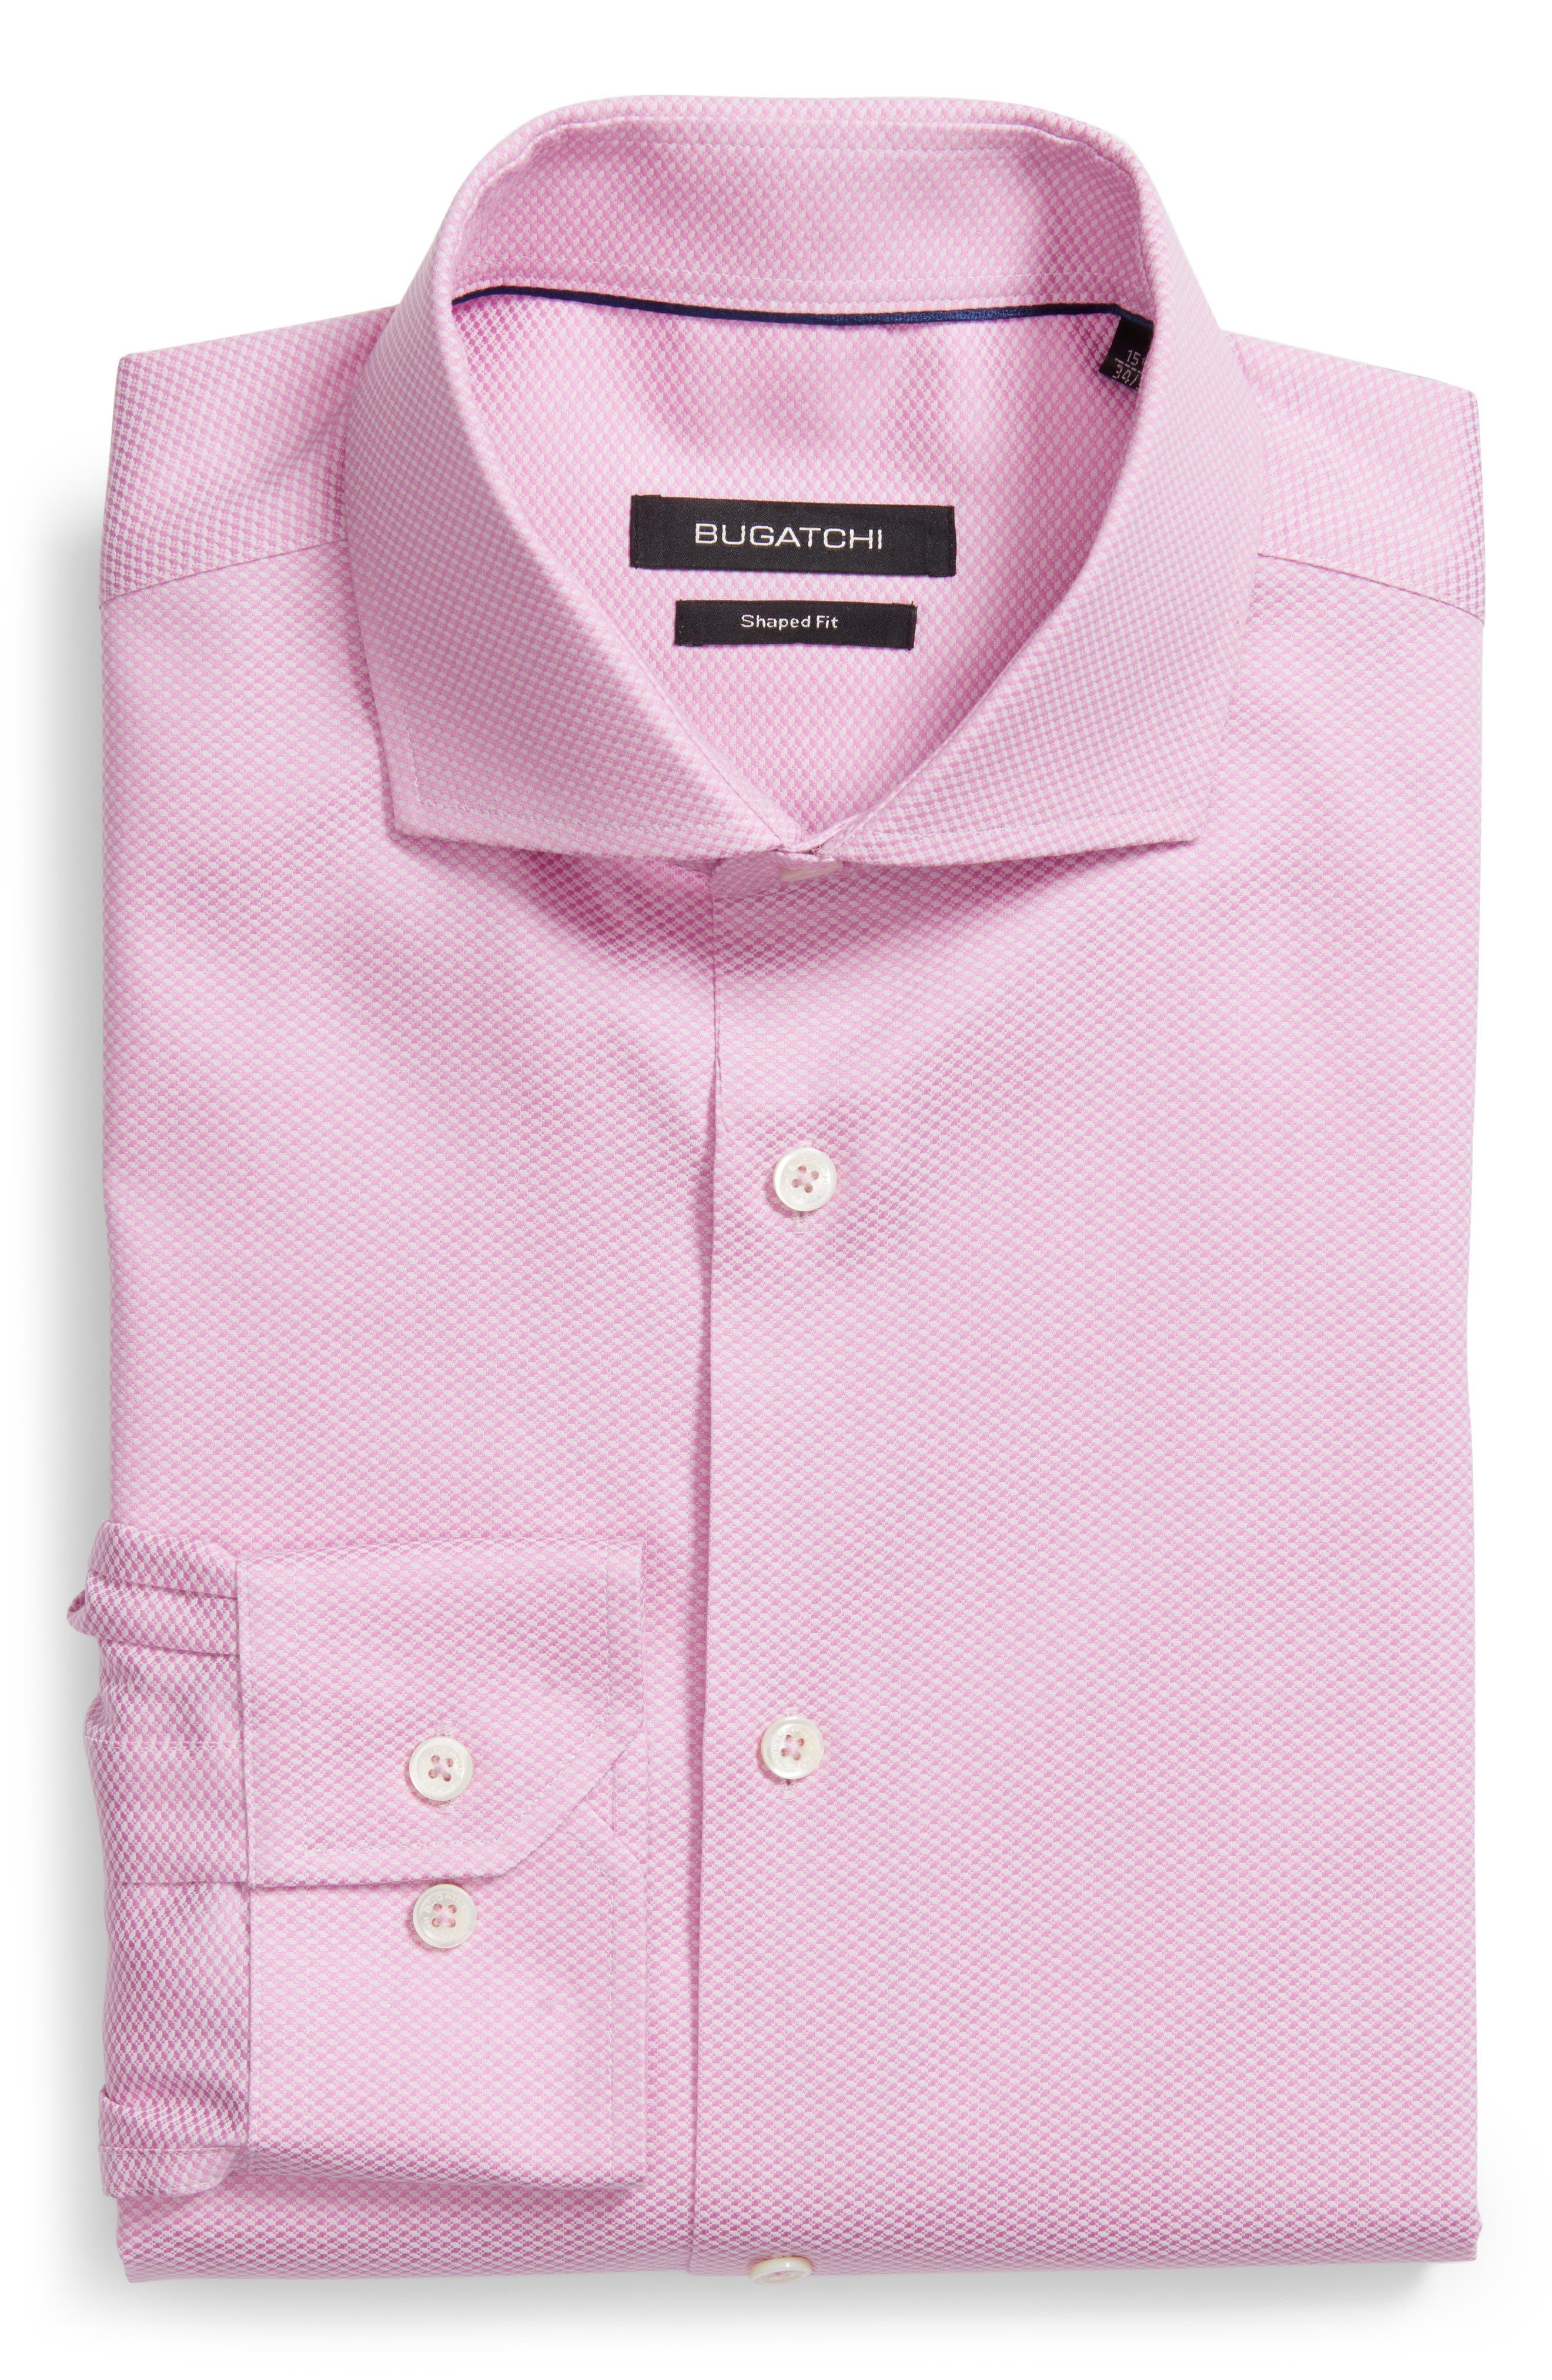 Trim Fit Dress Shirt,                             Main thumbnail 1, color,                             PINK